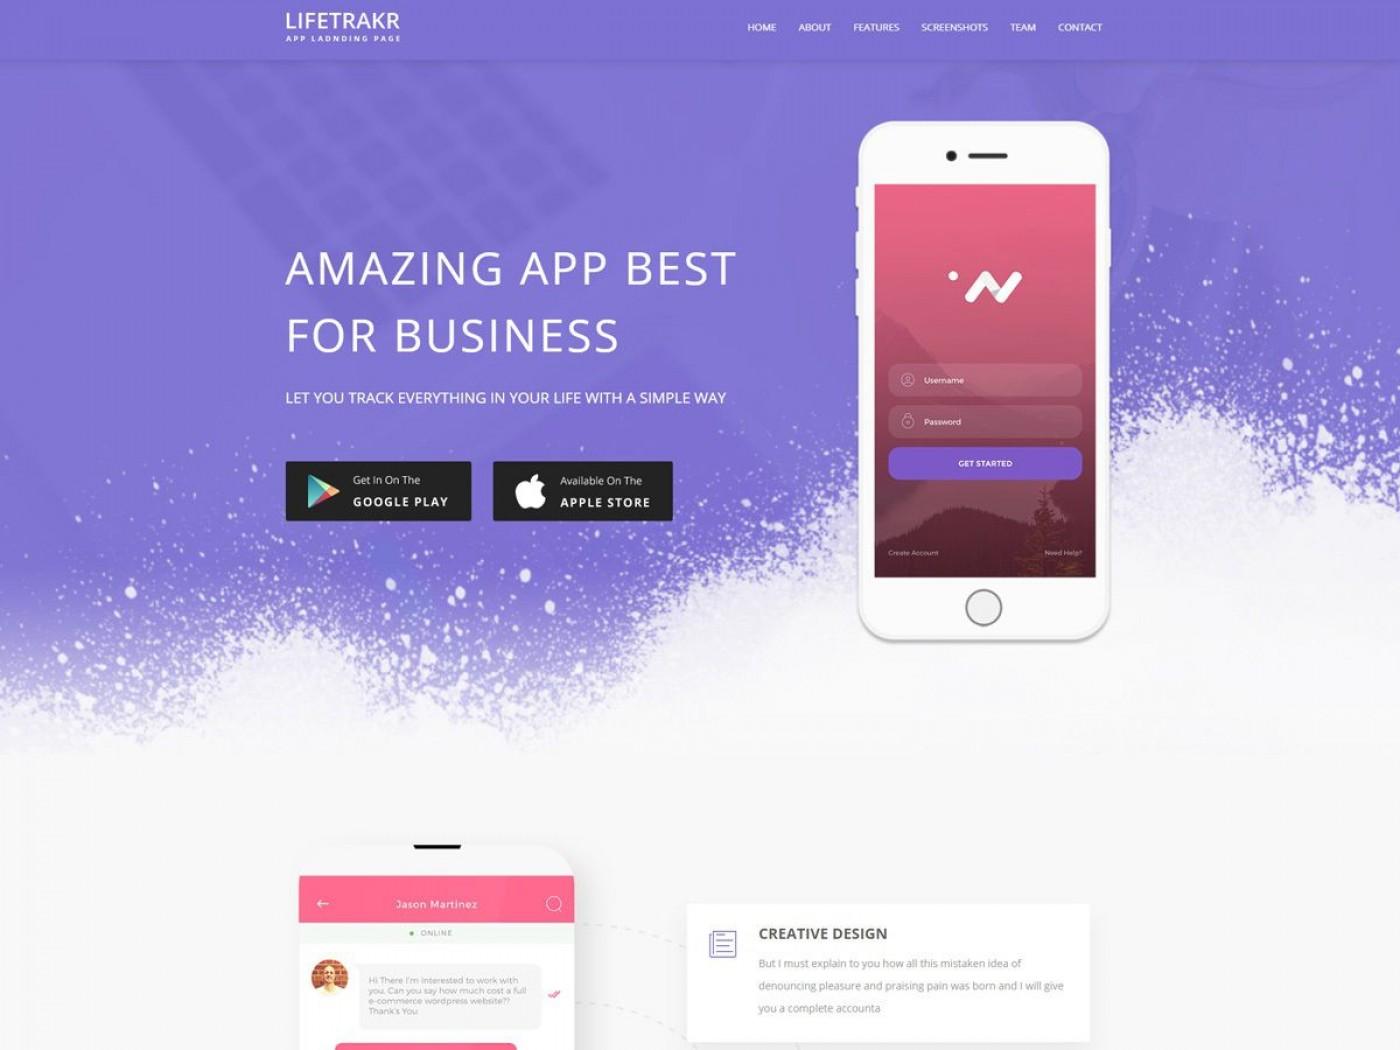 006 Fantastic Lifetracker Free Responsive Bootstrap App Landing Page Template Idea 1400